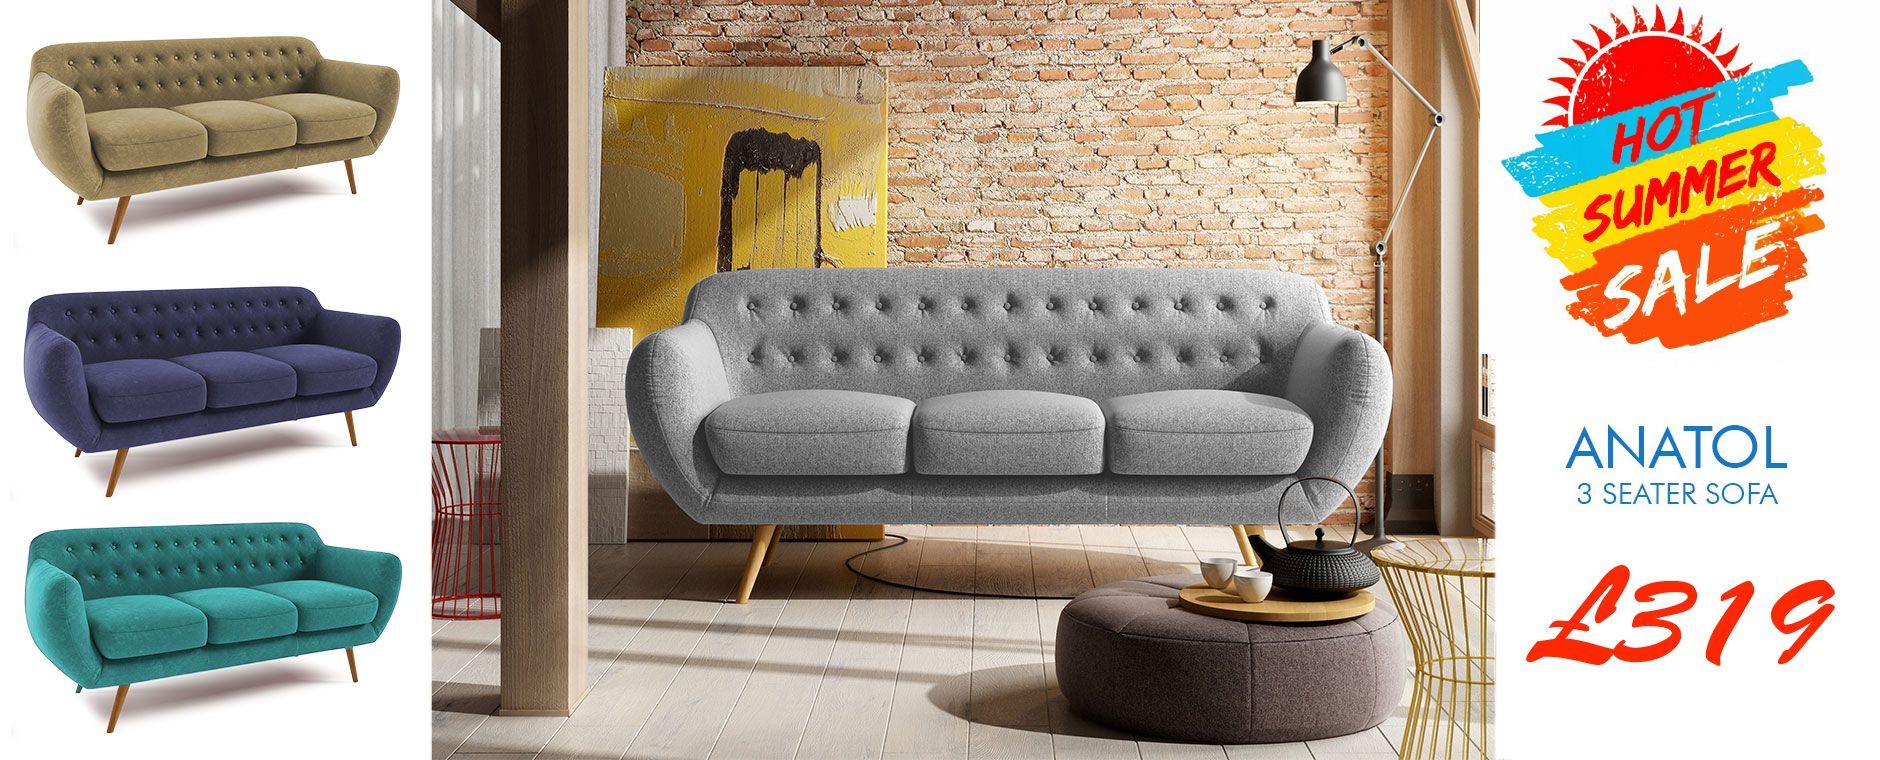 Geräumig Retrosofa Ideen Von Rea 2 Seater Retro Sofa